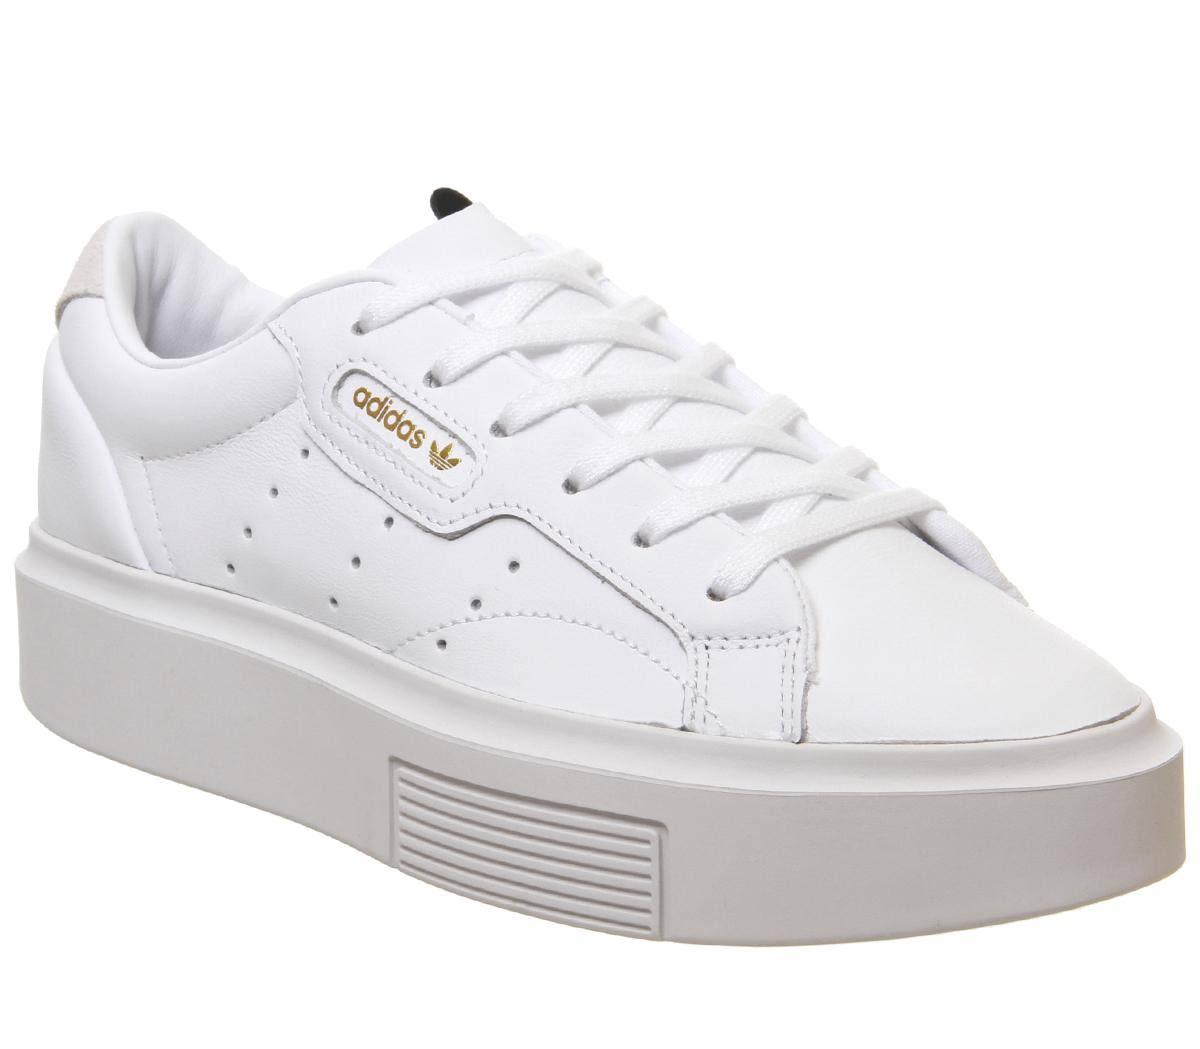 Adidas Sleek Super Shoes - White - Women